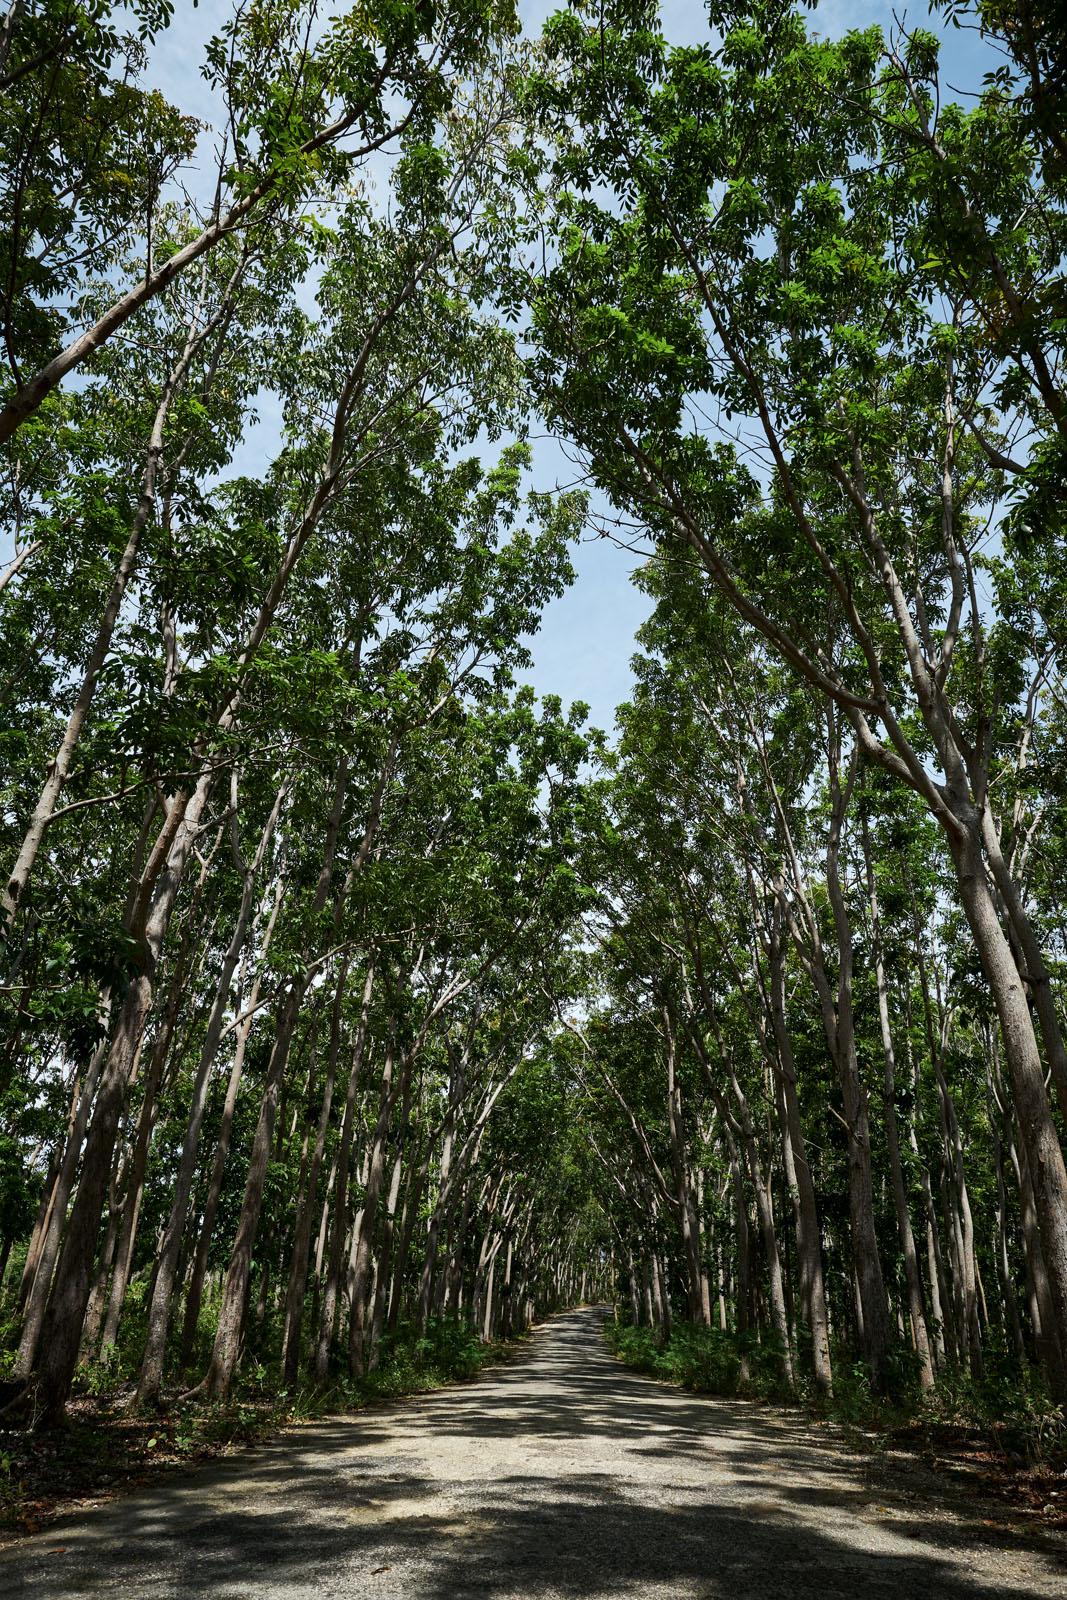 exotic, tropical vegetation provides shade for the traveller